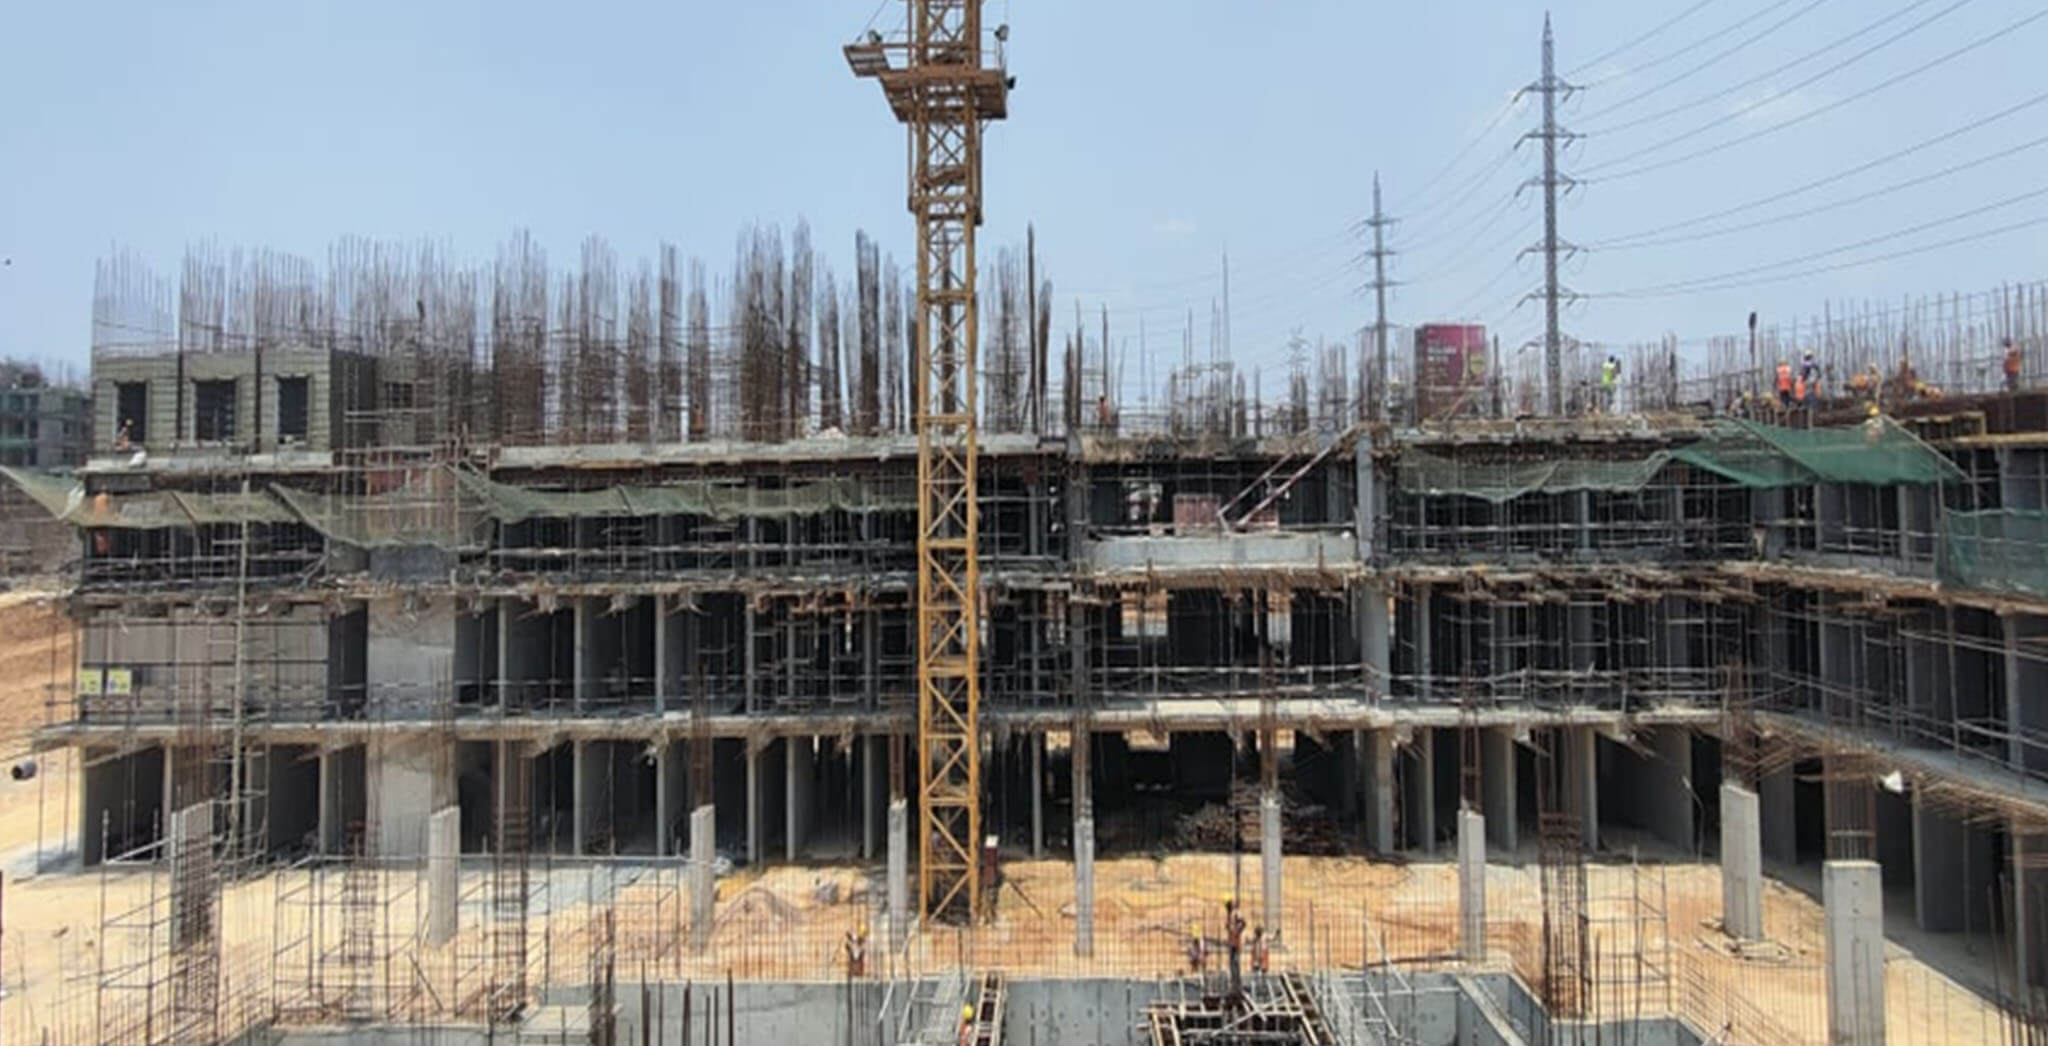 Apr 2021 - Jasper Block: Wing A—Flats 0101, 0102 aluminium shuttering work-in-progress